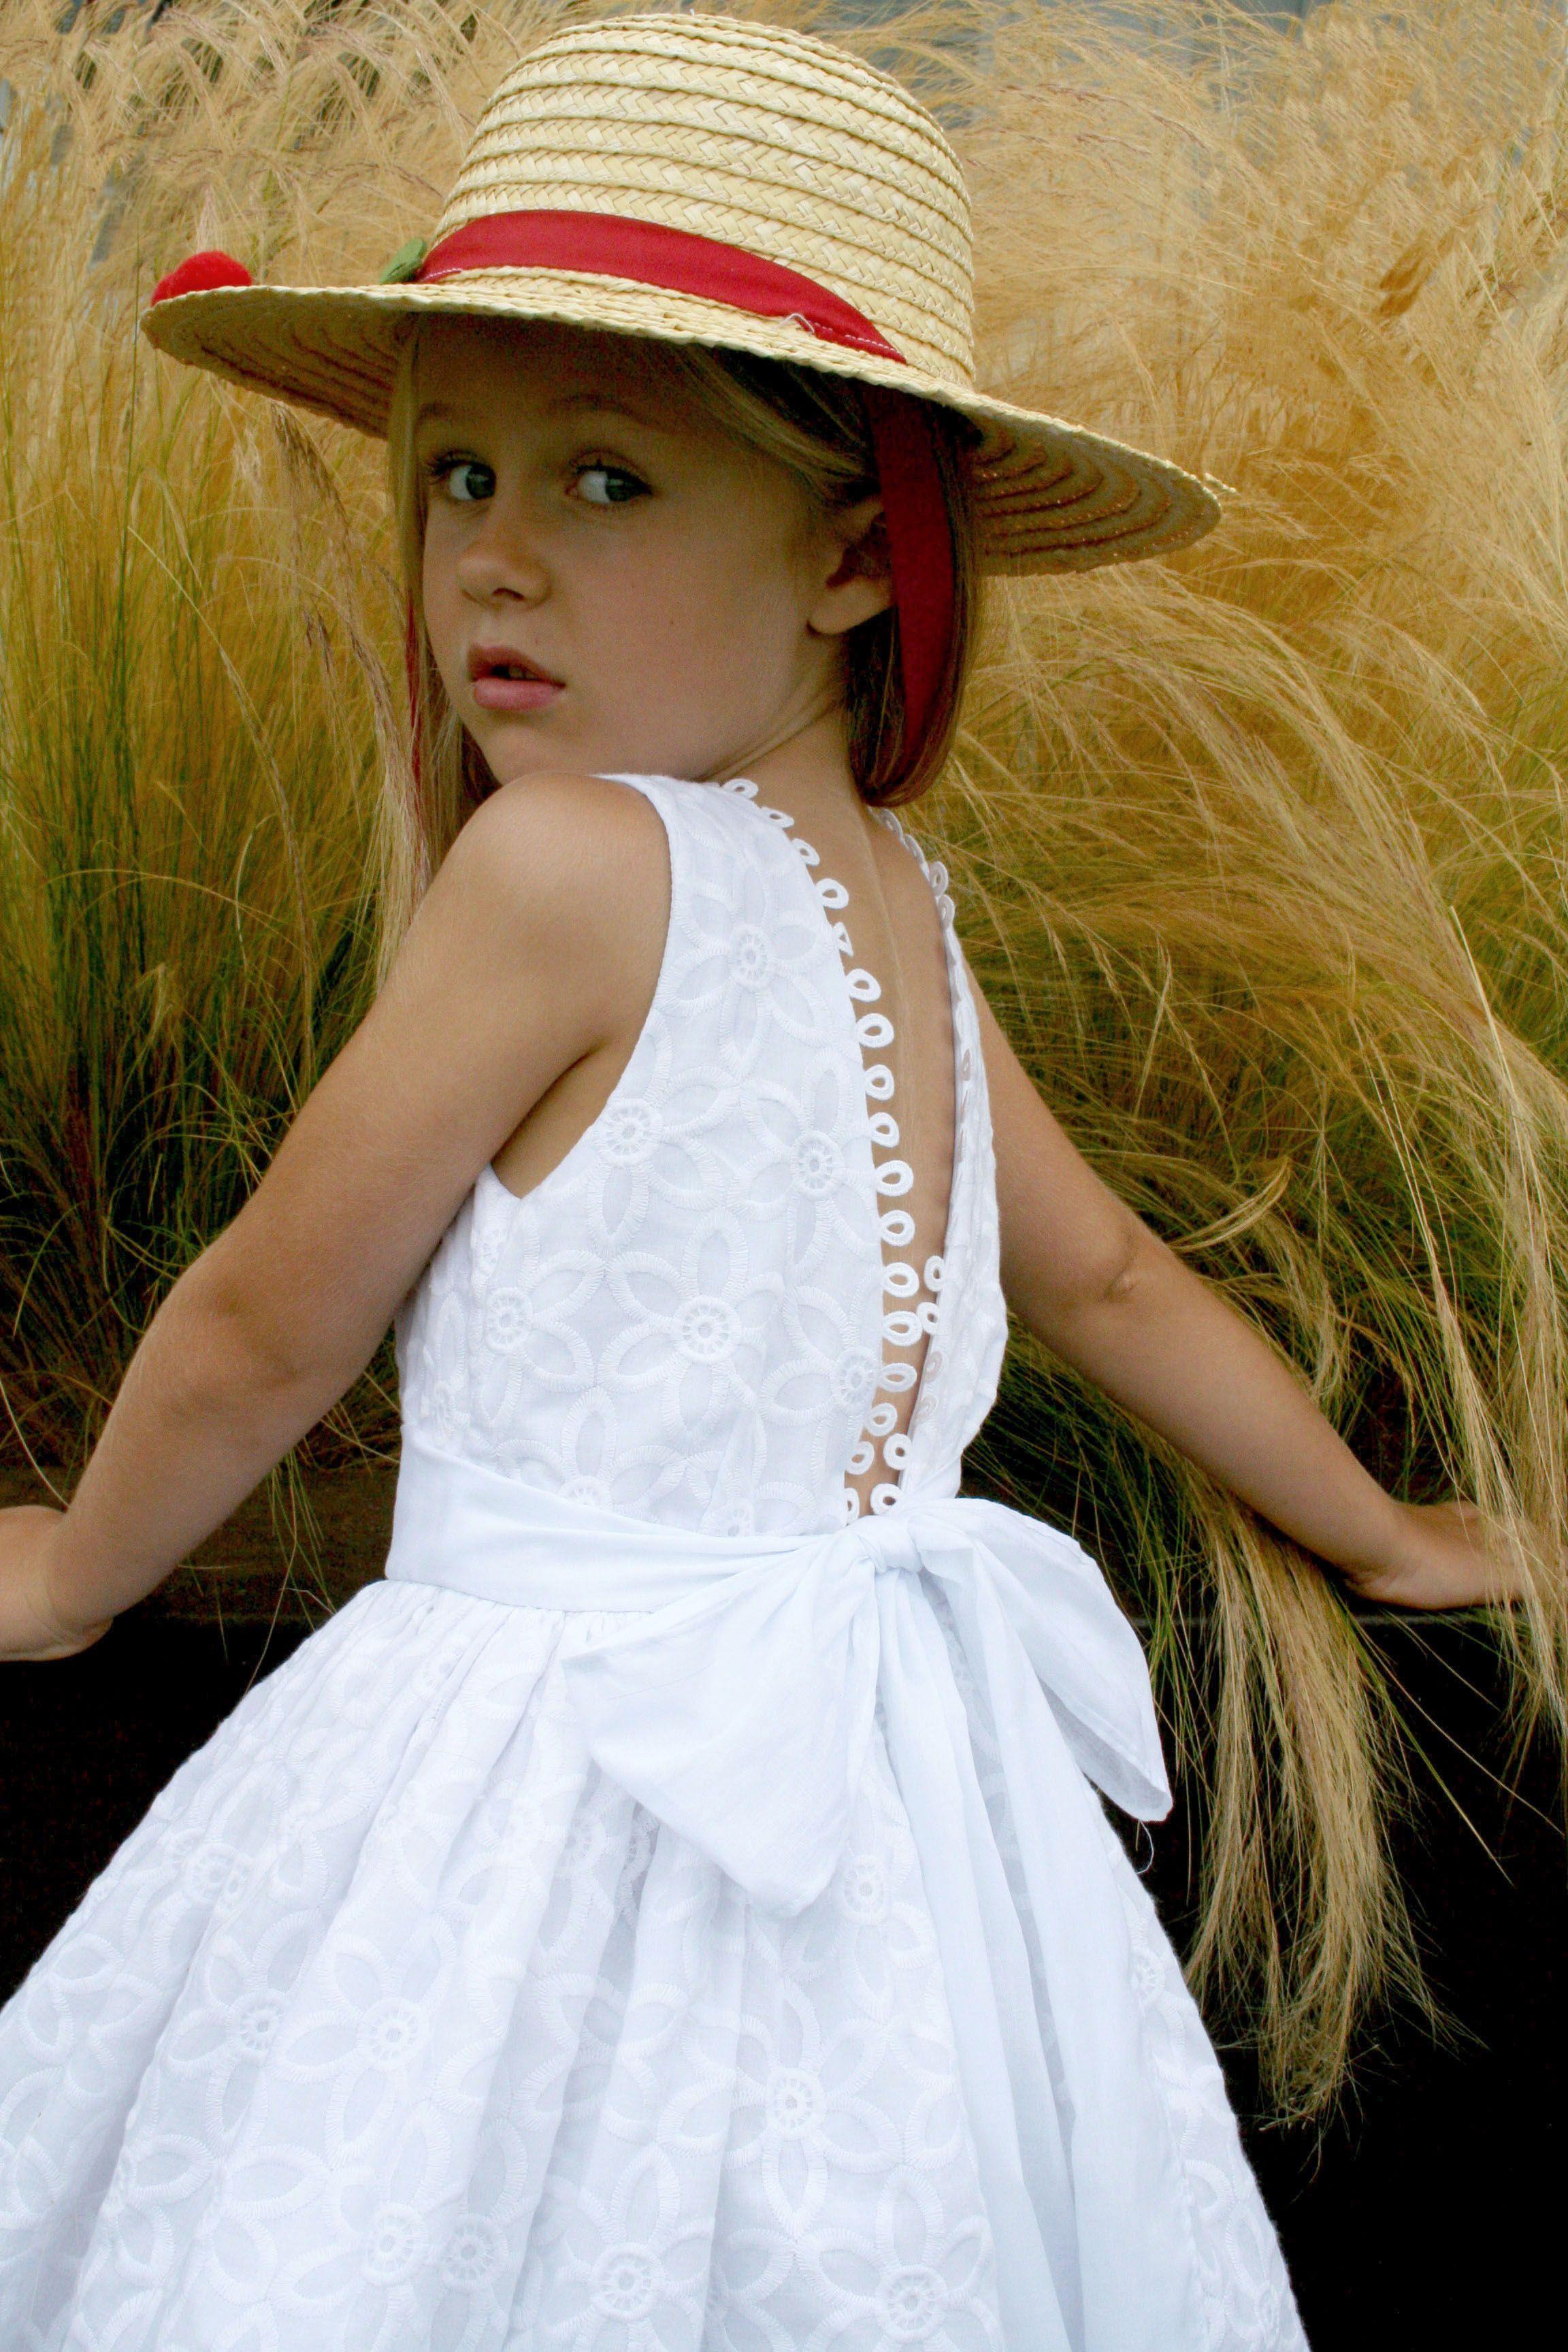 White Cotton Eyelet Dress With Open Back Trimmed Wit White Cotton Loops Fully Lined Isabel Garreton Spring Summ Dresses Spring Summer Dress Summer Dresses [ 3456 x 2304 Pixel ]